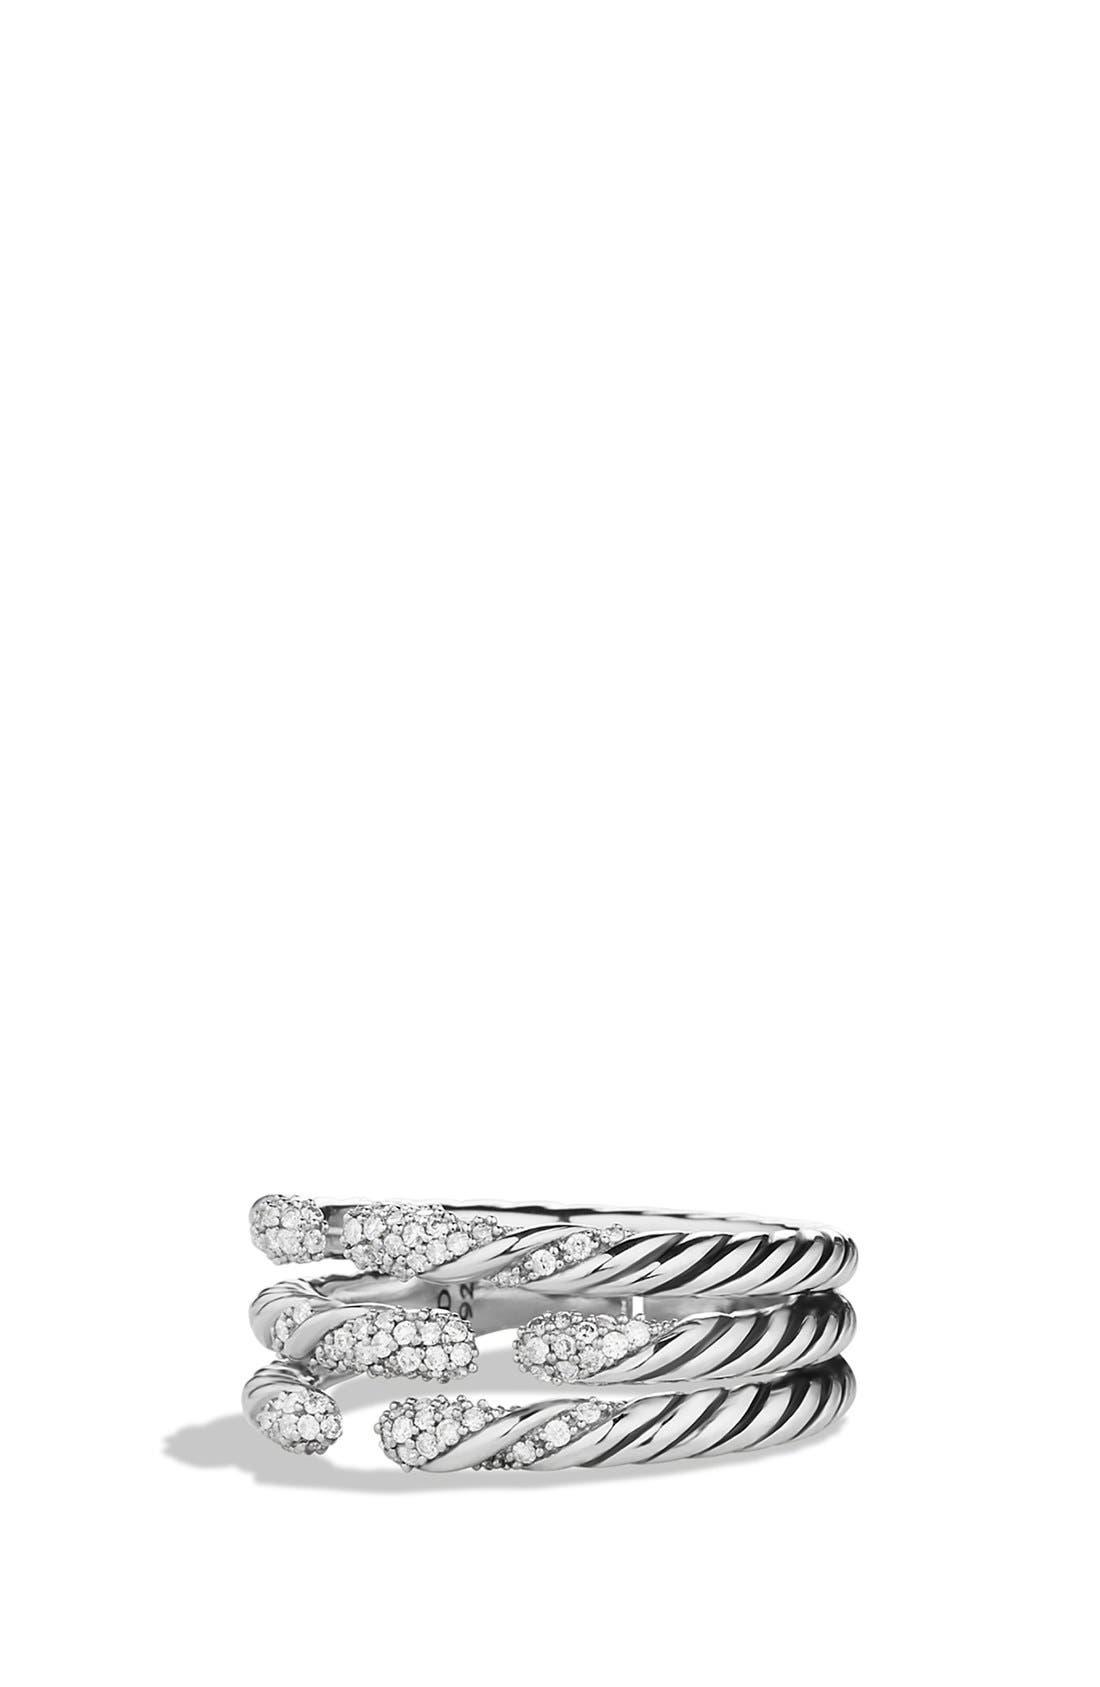 Alternate Image 1 Selected - David Yurman 'Willow' Three-Row Ring with Diamonds